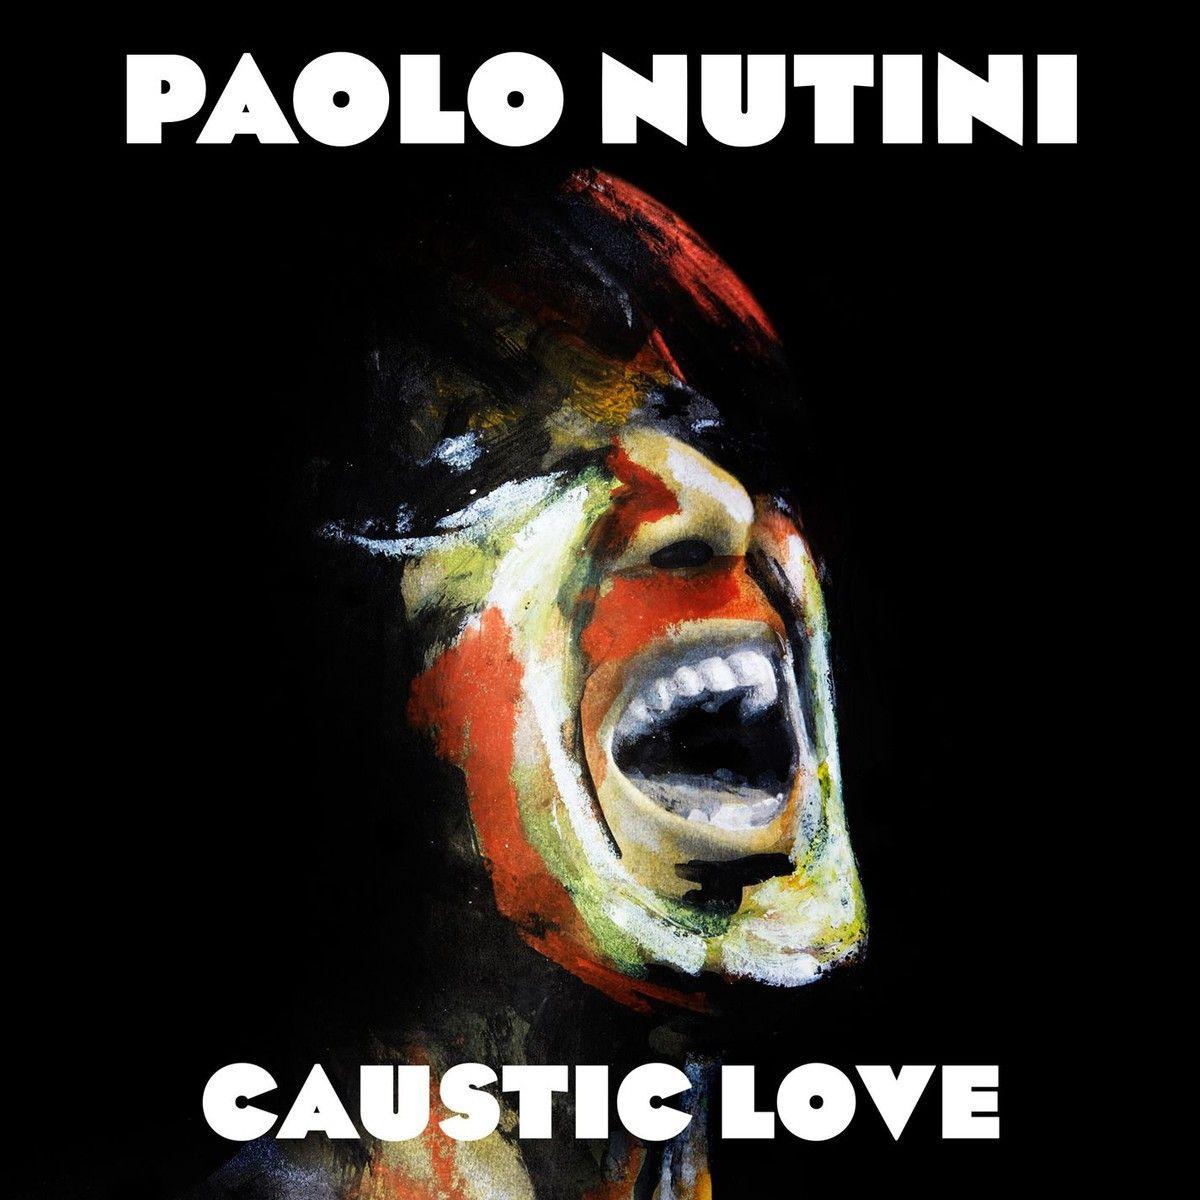 Paolo nutini caustic love raj pinterest uk charts and paolo nutini caustic love hexwebz Choice Image